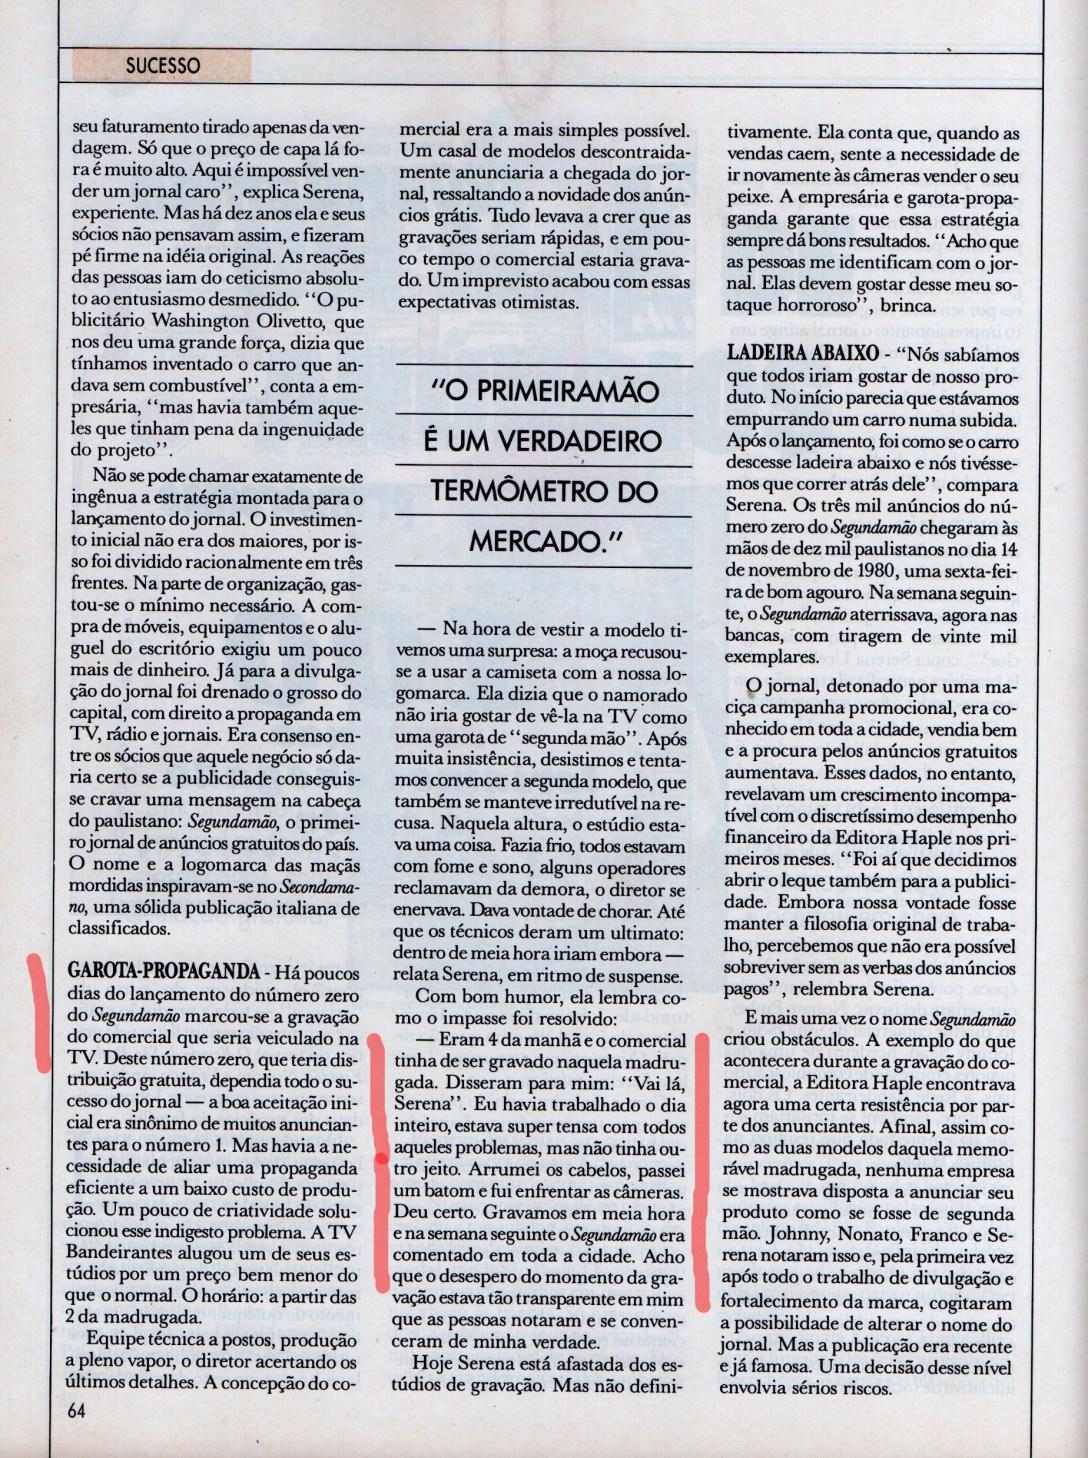 1989-02 Jornal Pequenas empresas grandes negocios 4